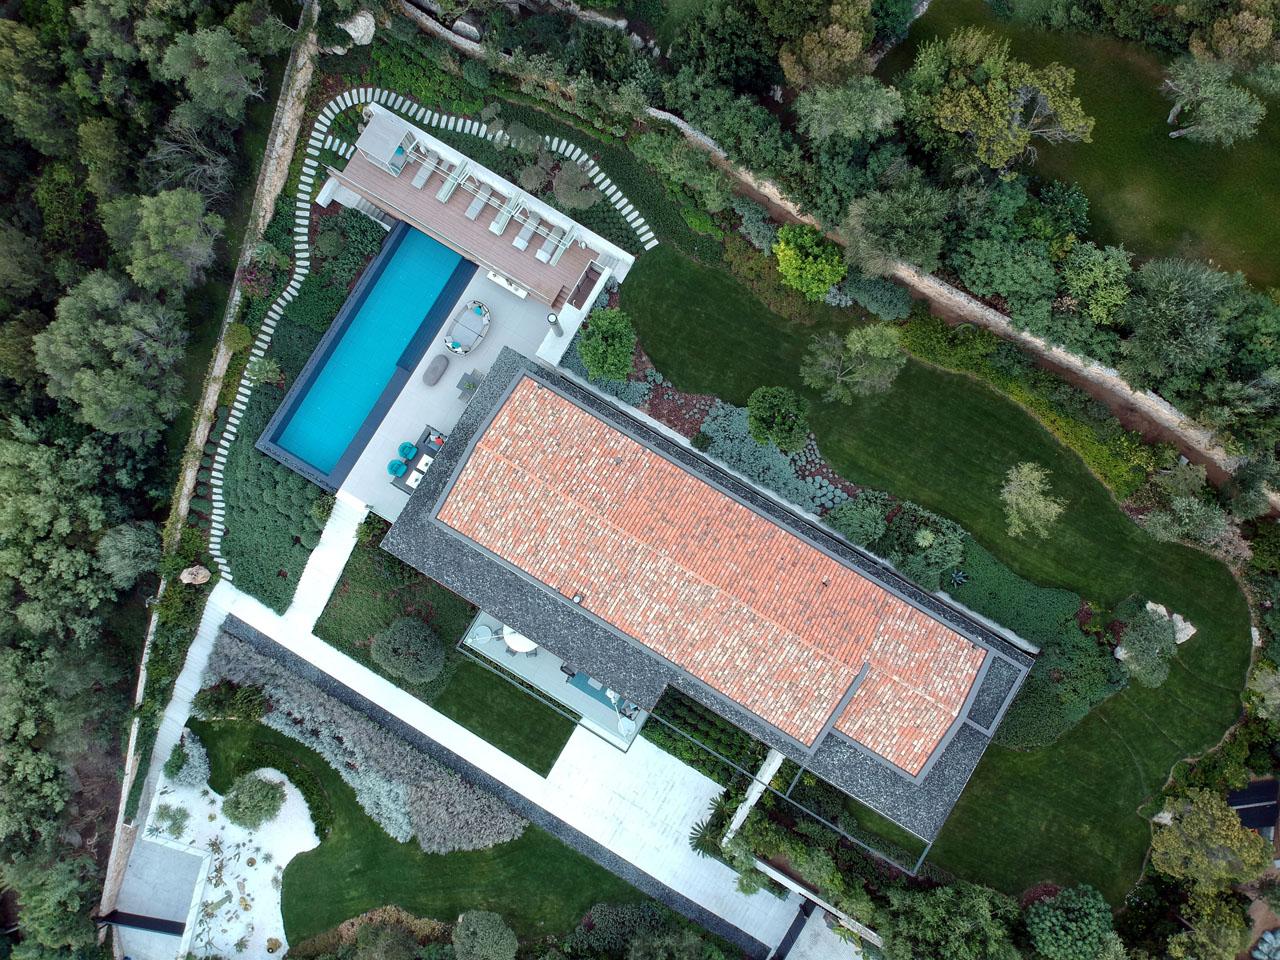 villa-emma-drone-shot